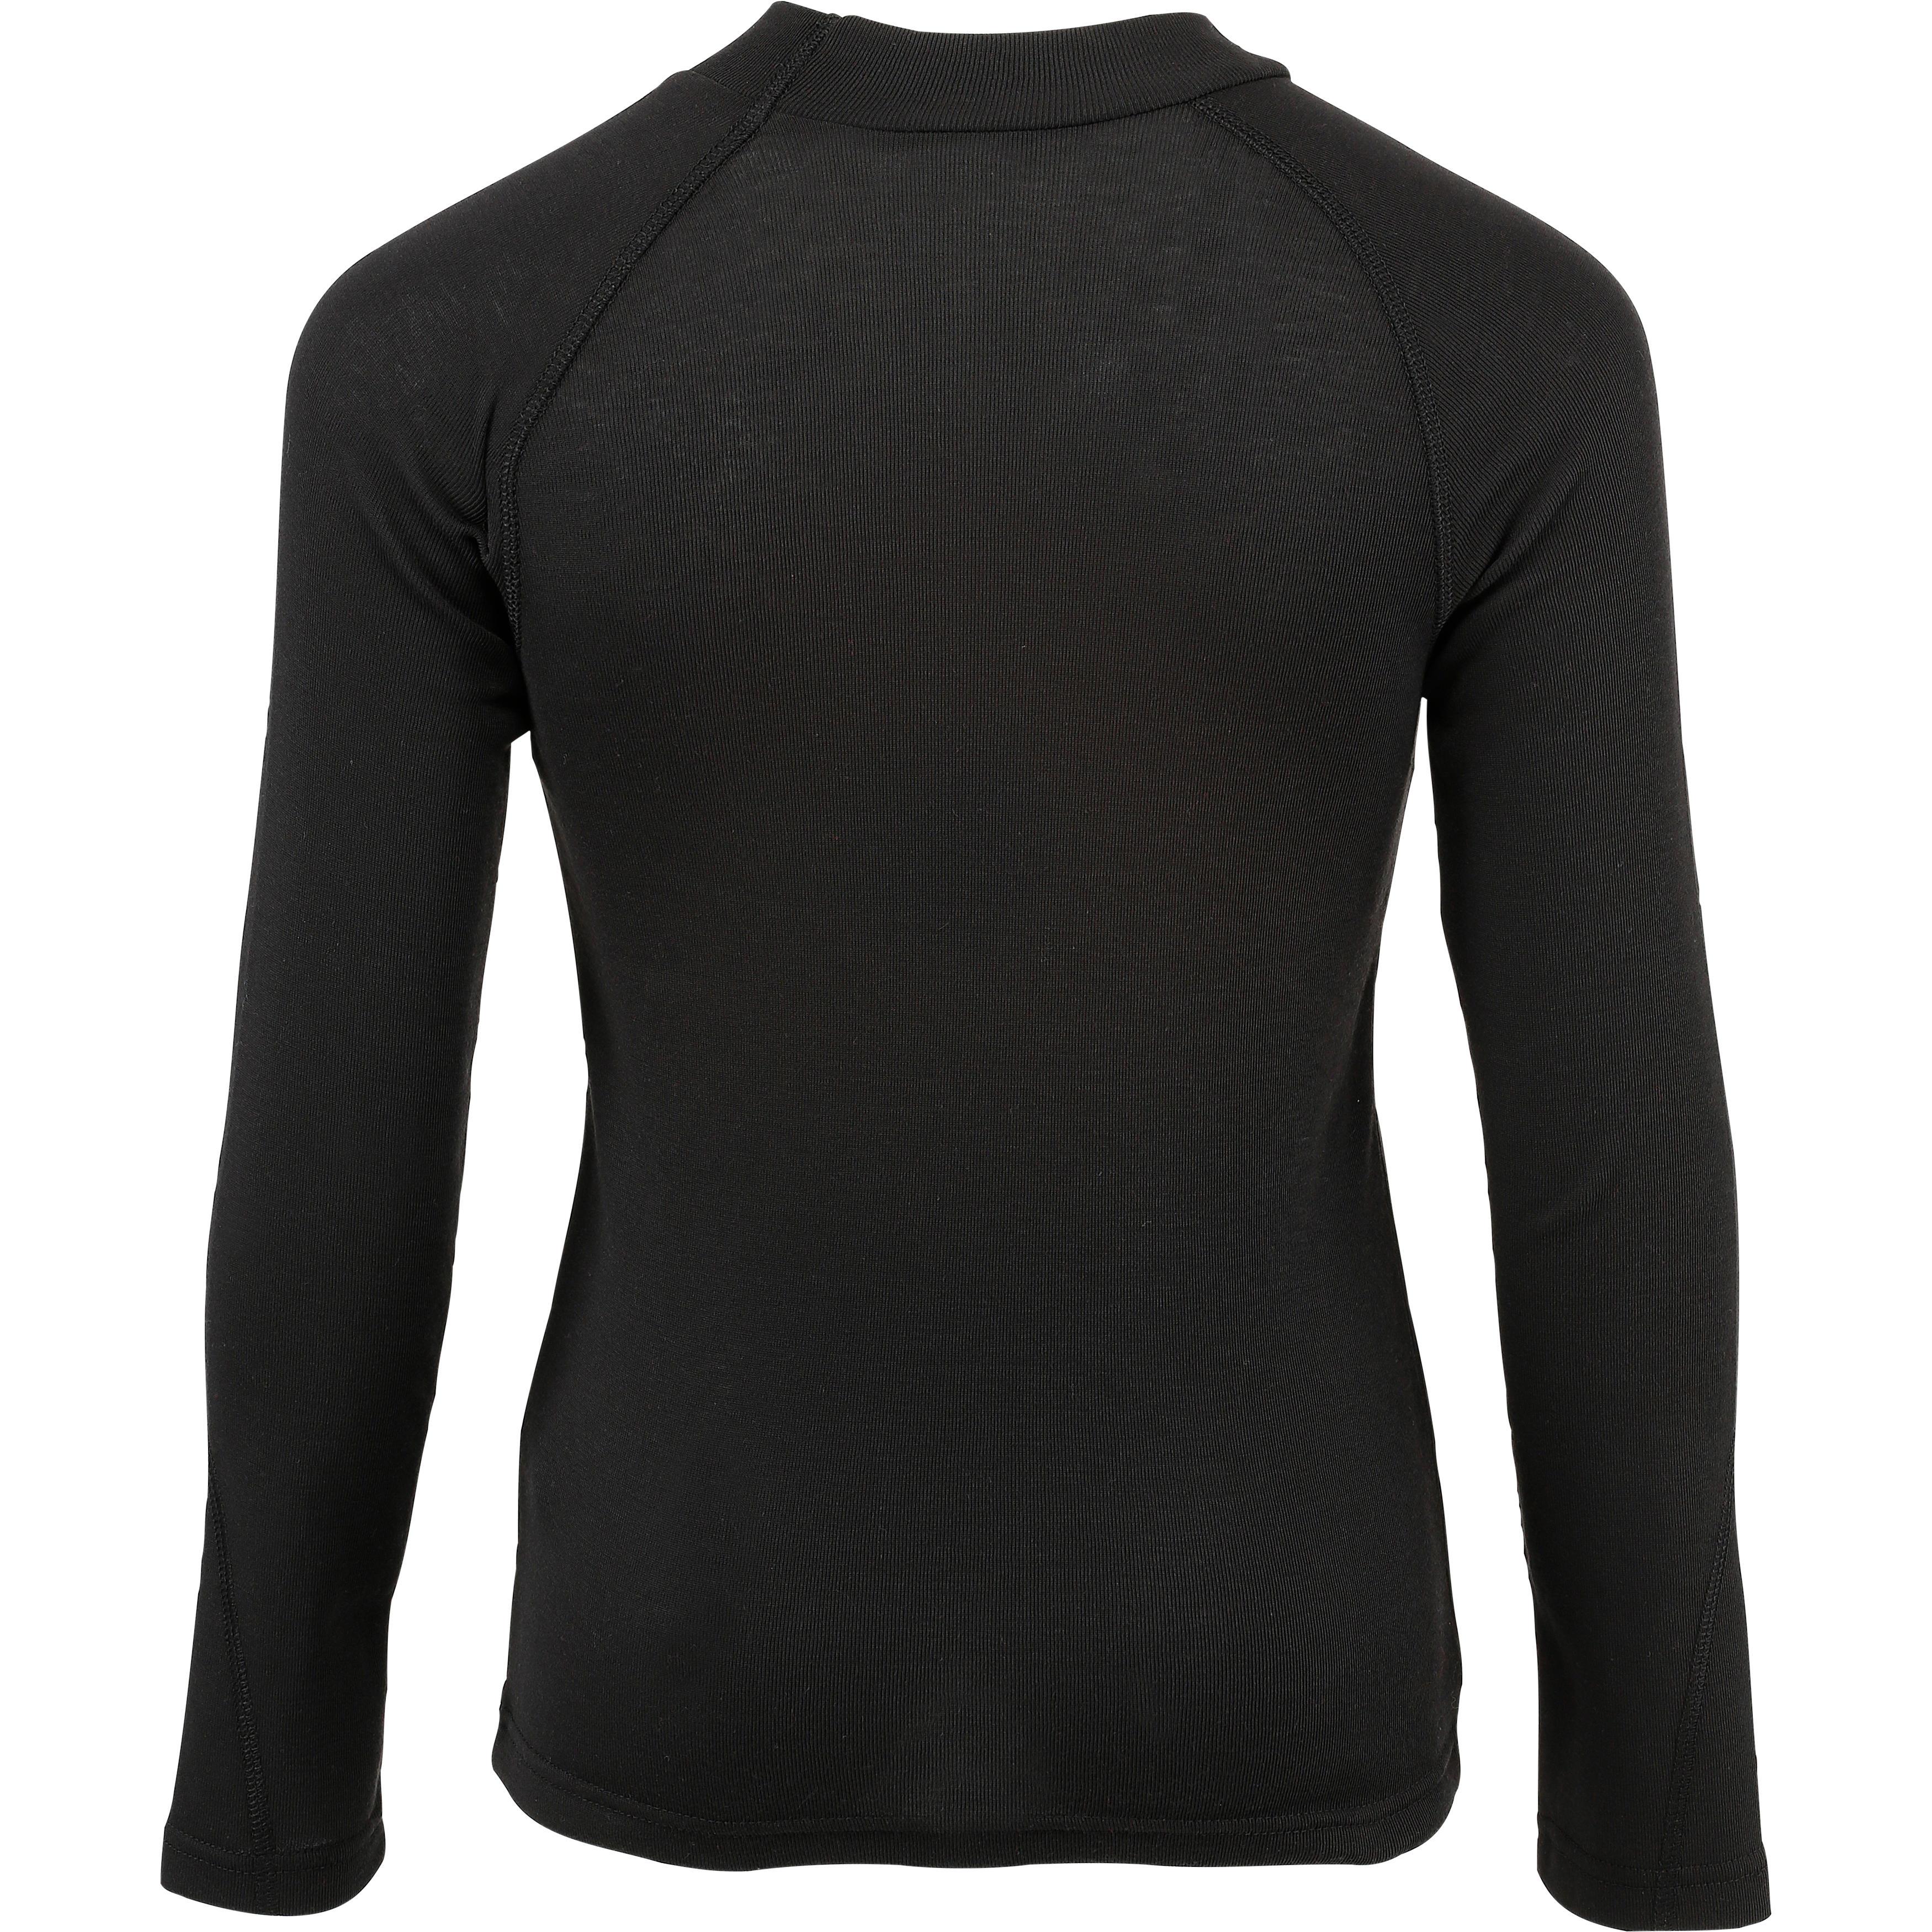 Comprar camisetas deportivas para niños bebés decathlon jpg 250x250 Playeras  negra de ninos ce4b01ac79413